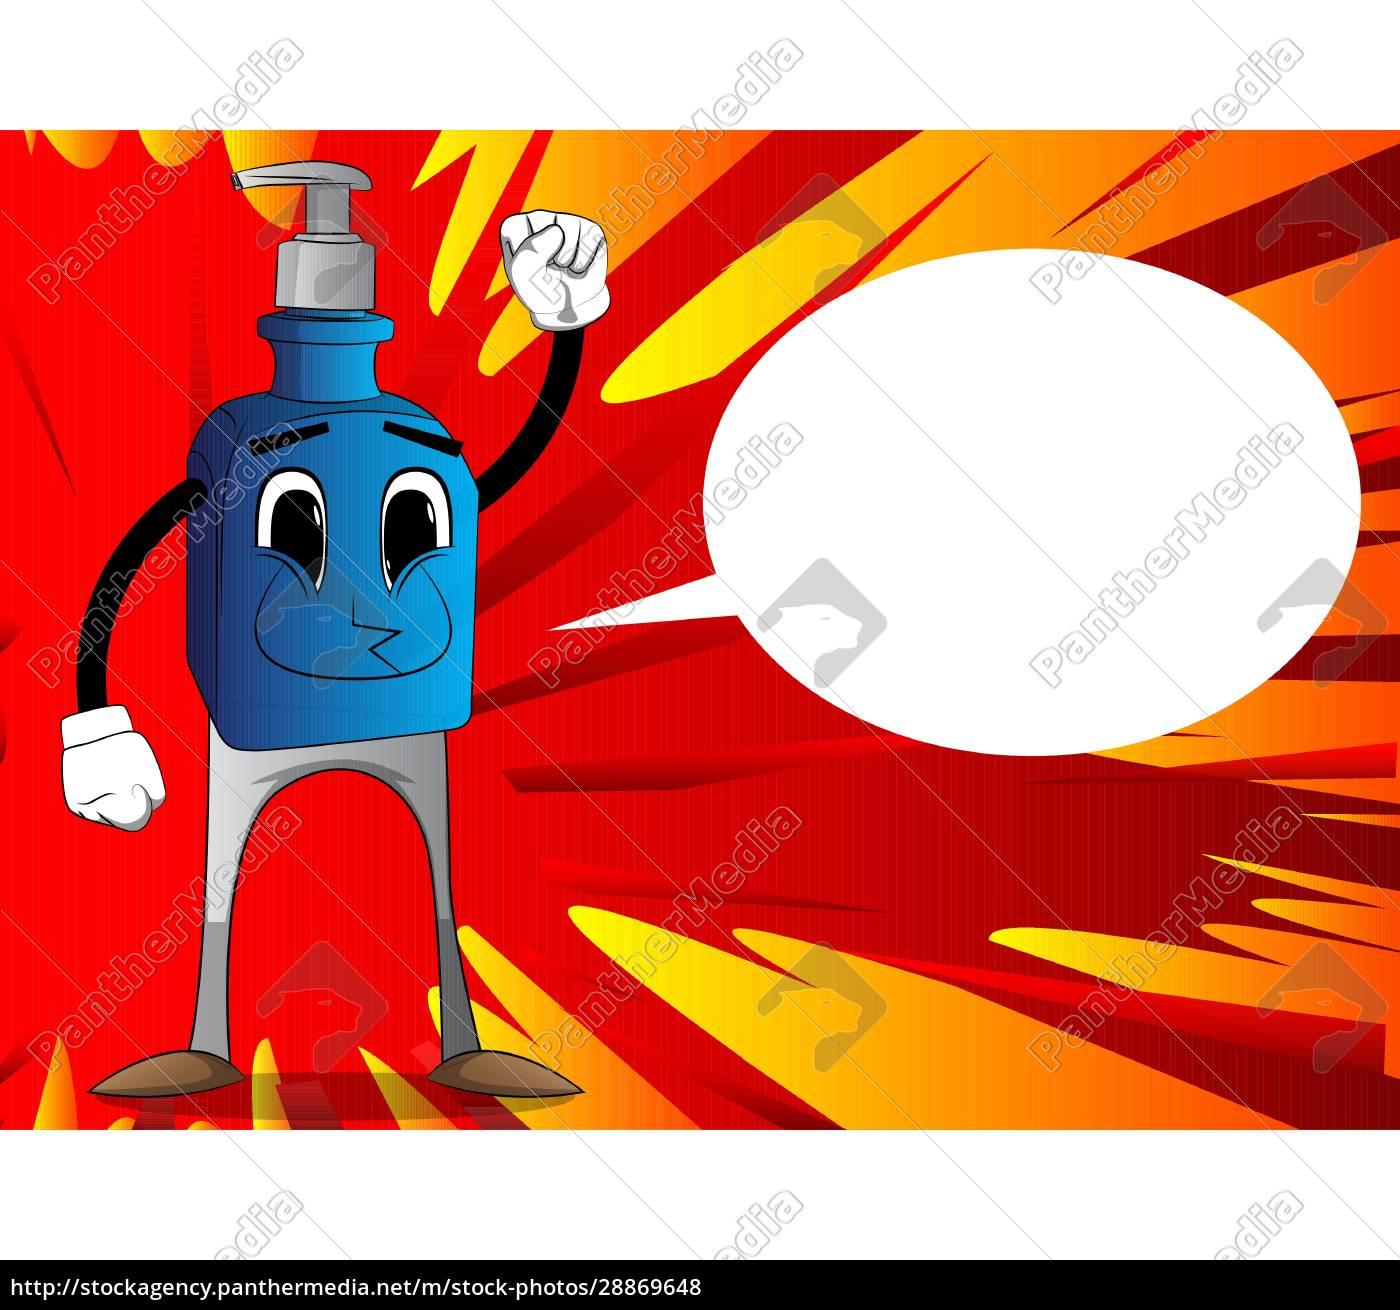 bottle, of, hand, sanitizer, making, power - 28869648